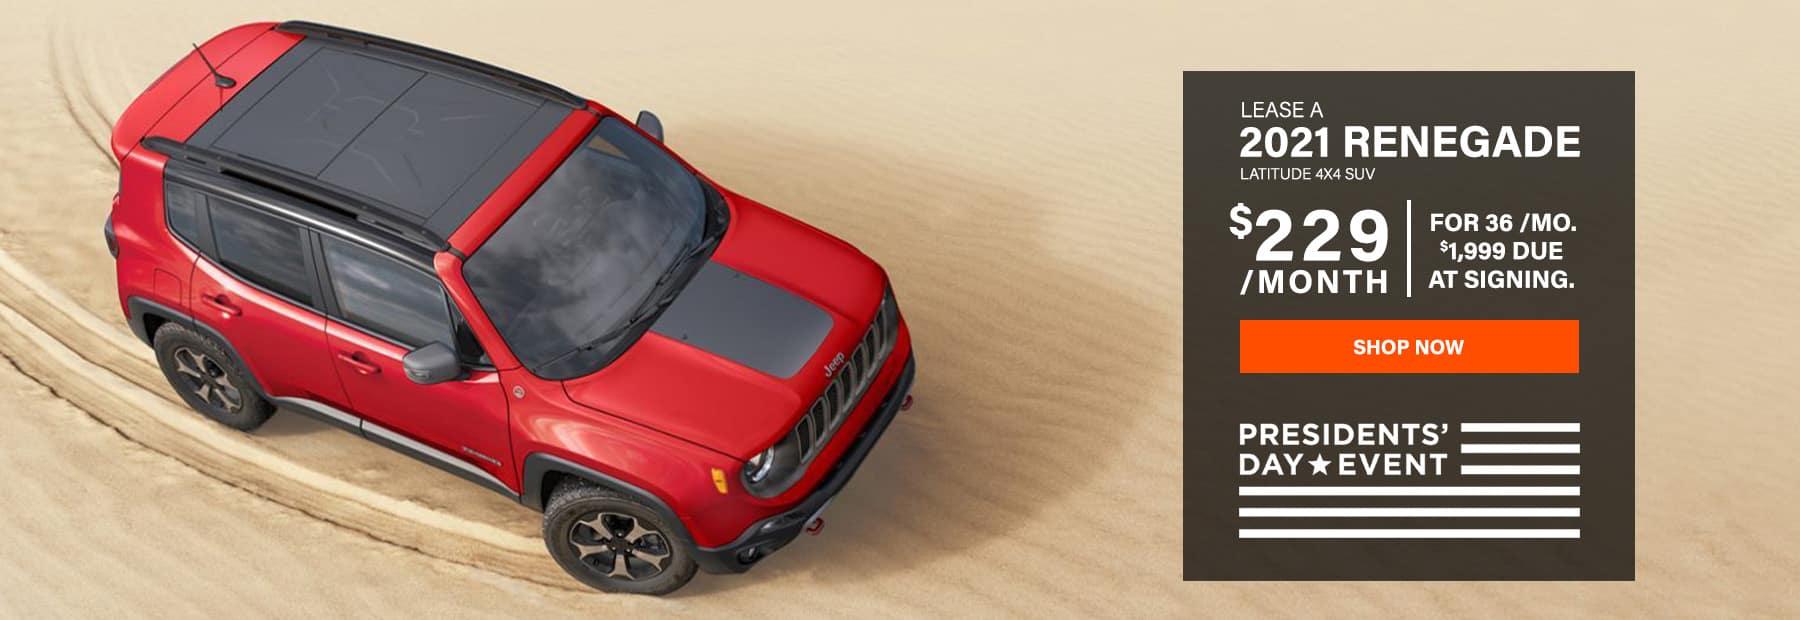 2021-02-03 Jeep Renegade Desktop